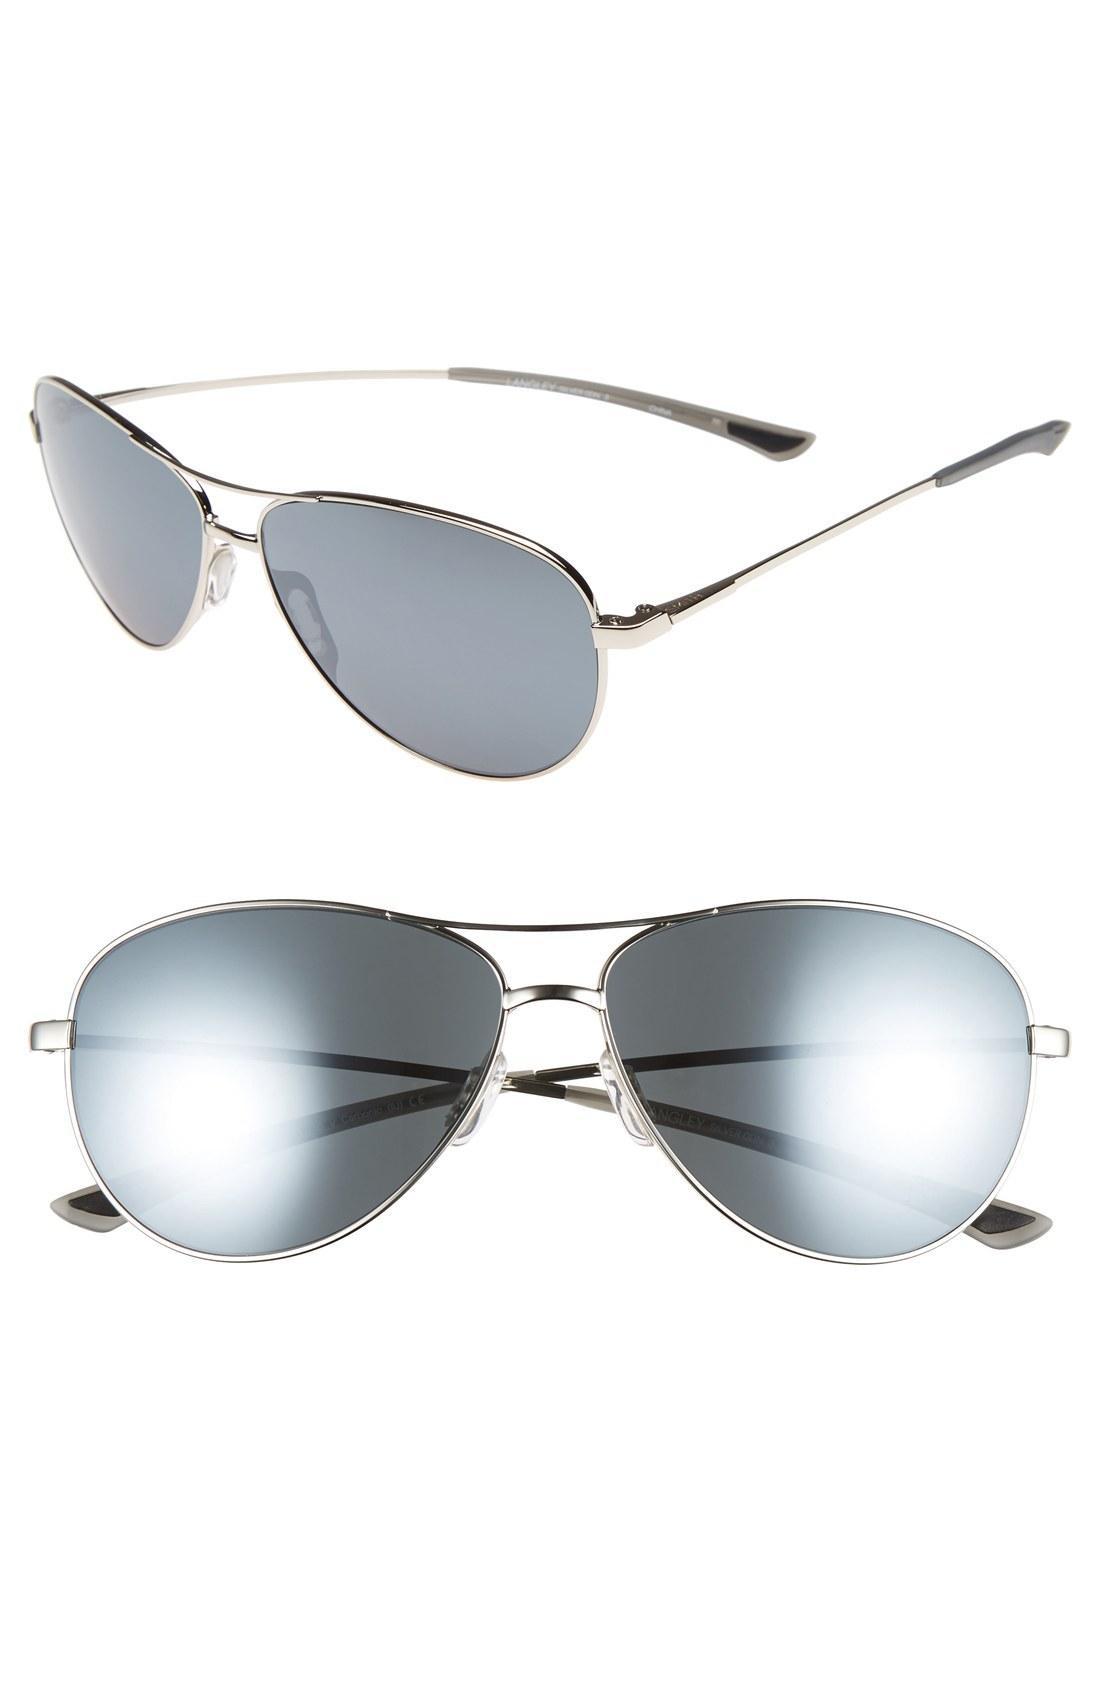 62140c416842f Smith  Langley  60Mm Aviator Sunglasses - Silver